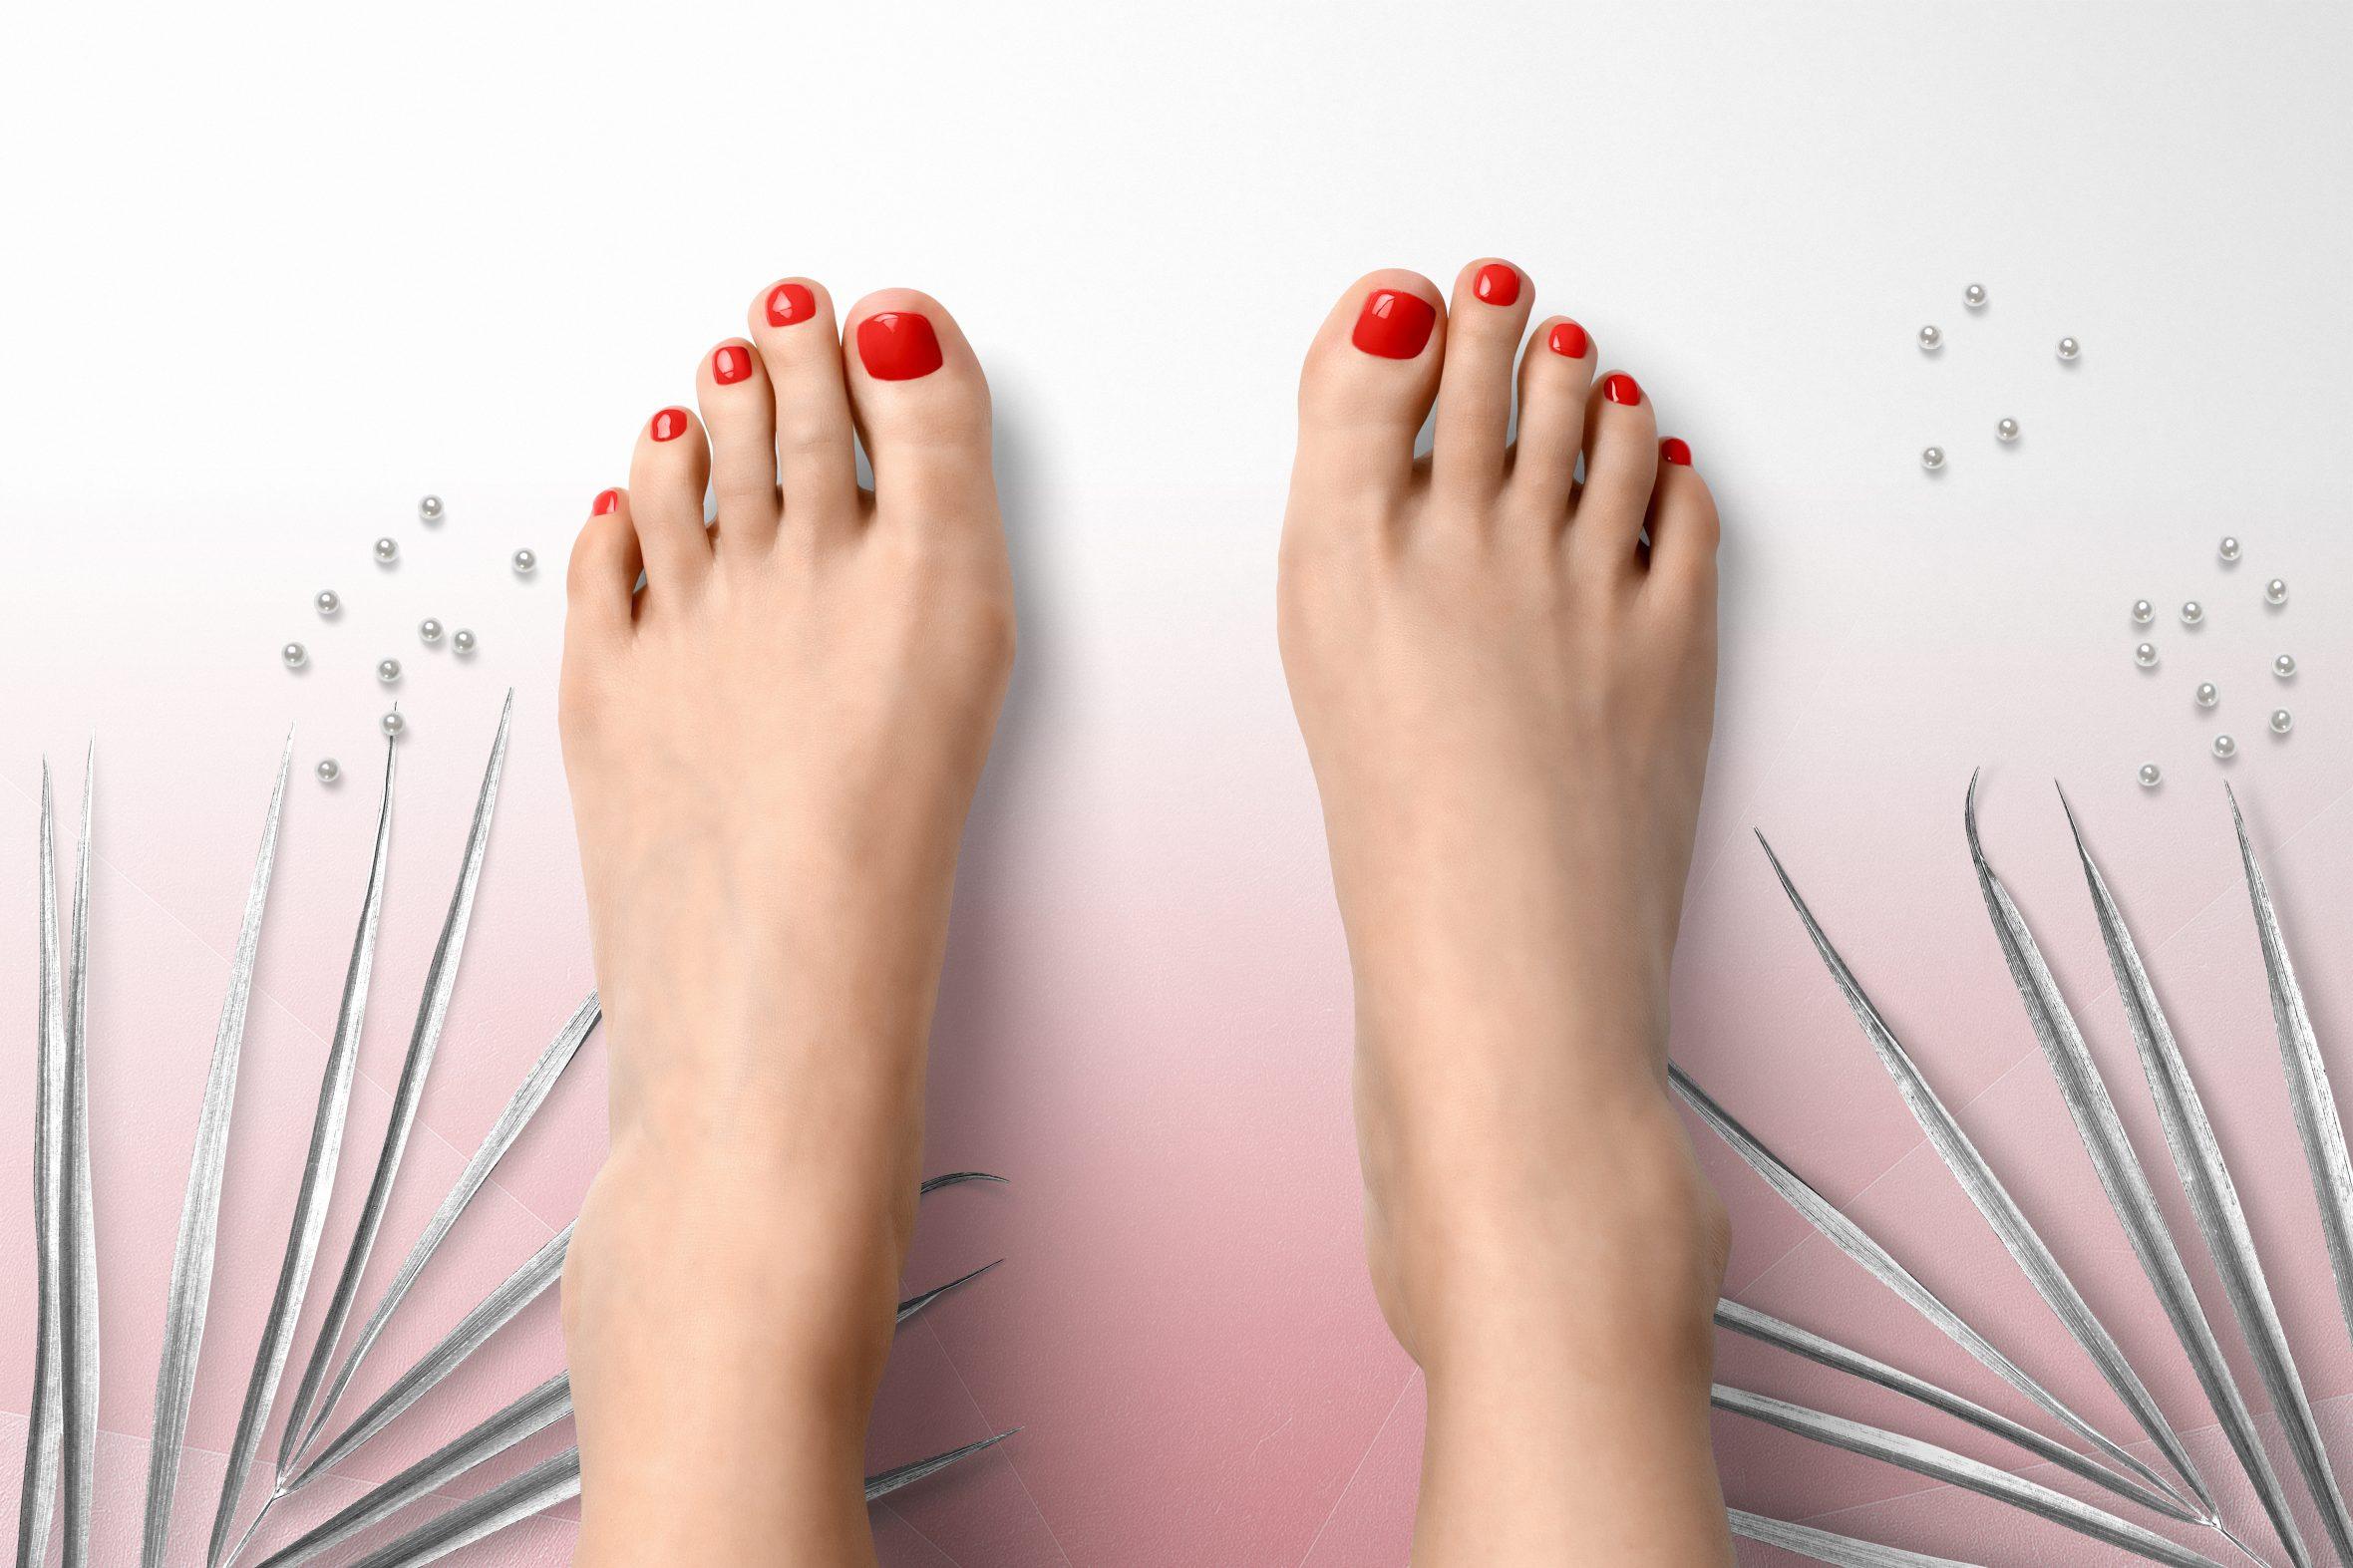 Donker oranje nagellak voor on trend manicure